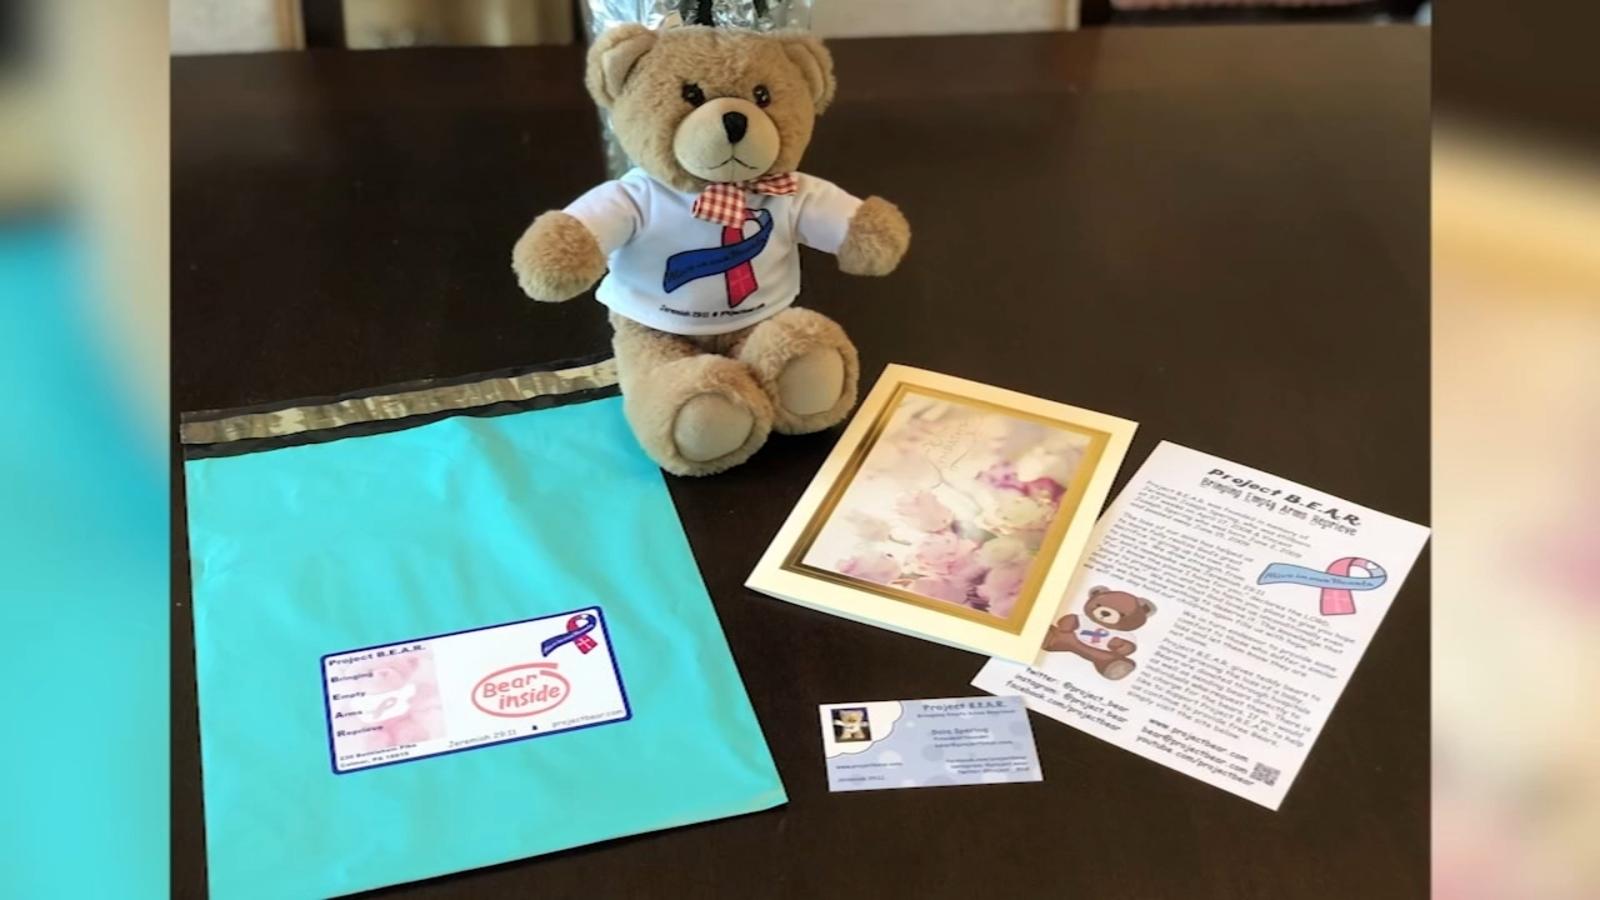 Mom gives 'bear hug' to families who lose infants